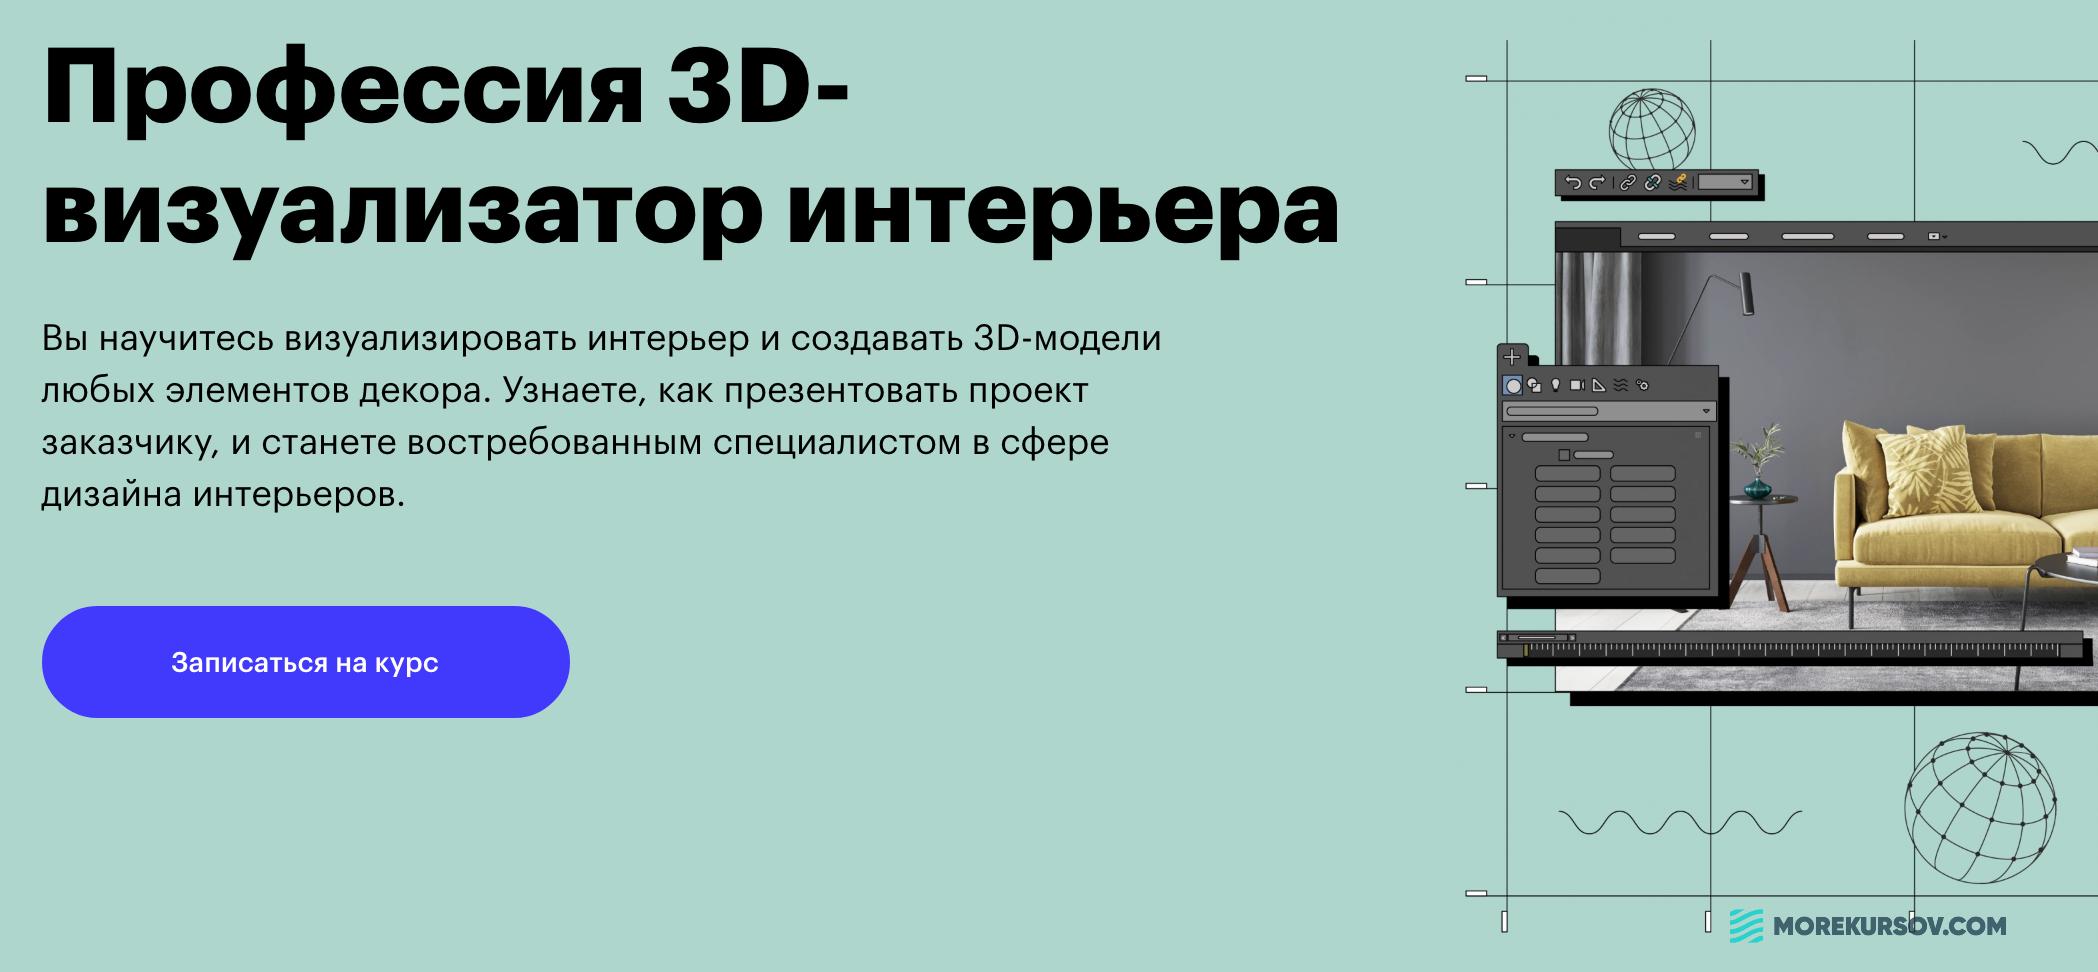 snimok-ehkrana-2020-09-13-v-11-32-14-png.9629